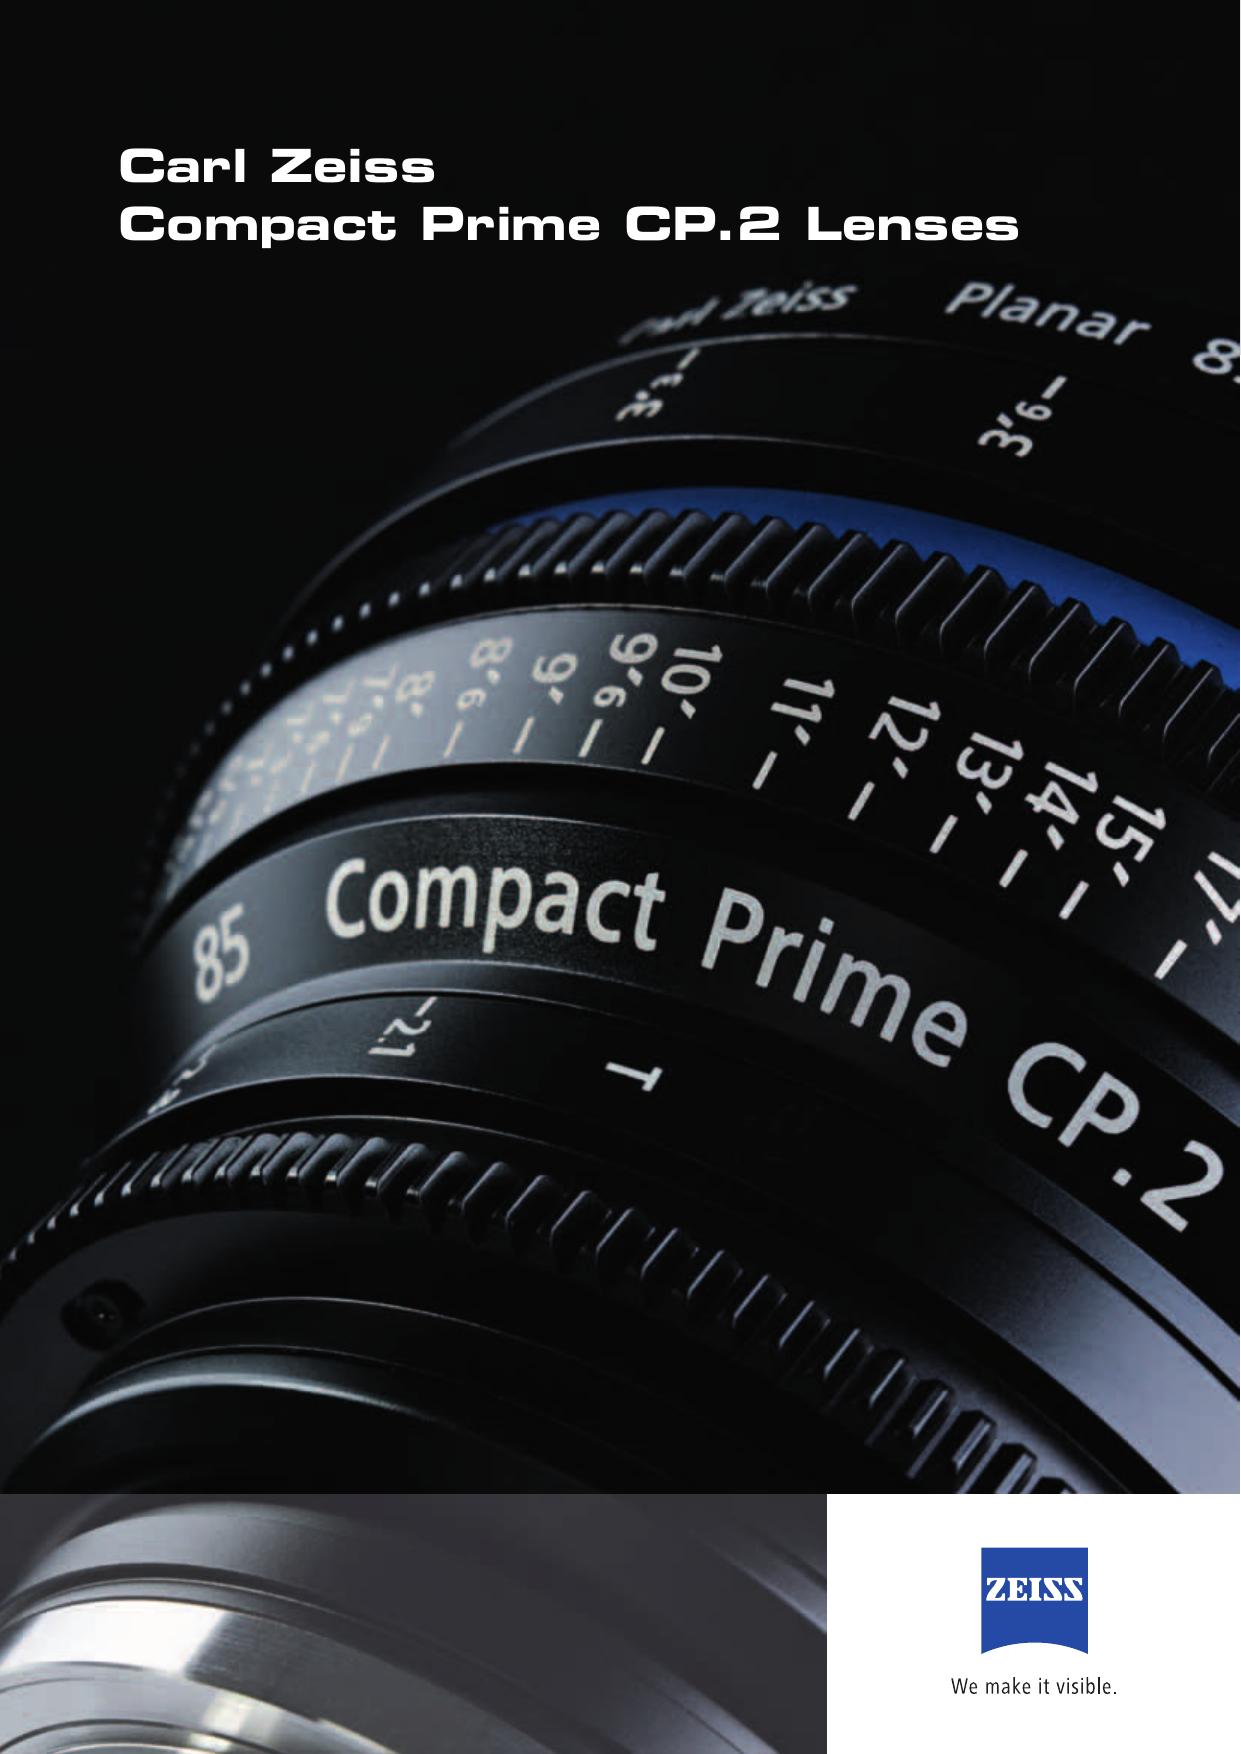 Carl Zeiss Compact Prime CP 2 Lenses - Nivo | manualzz com